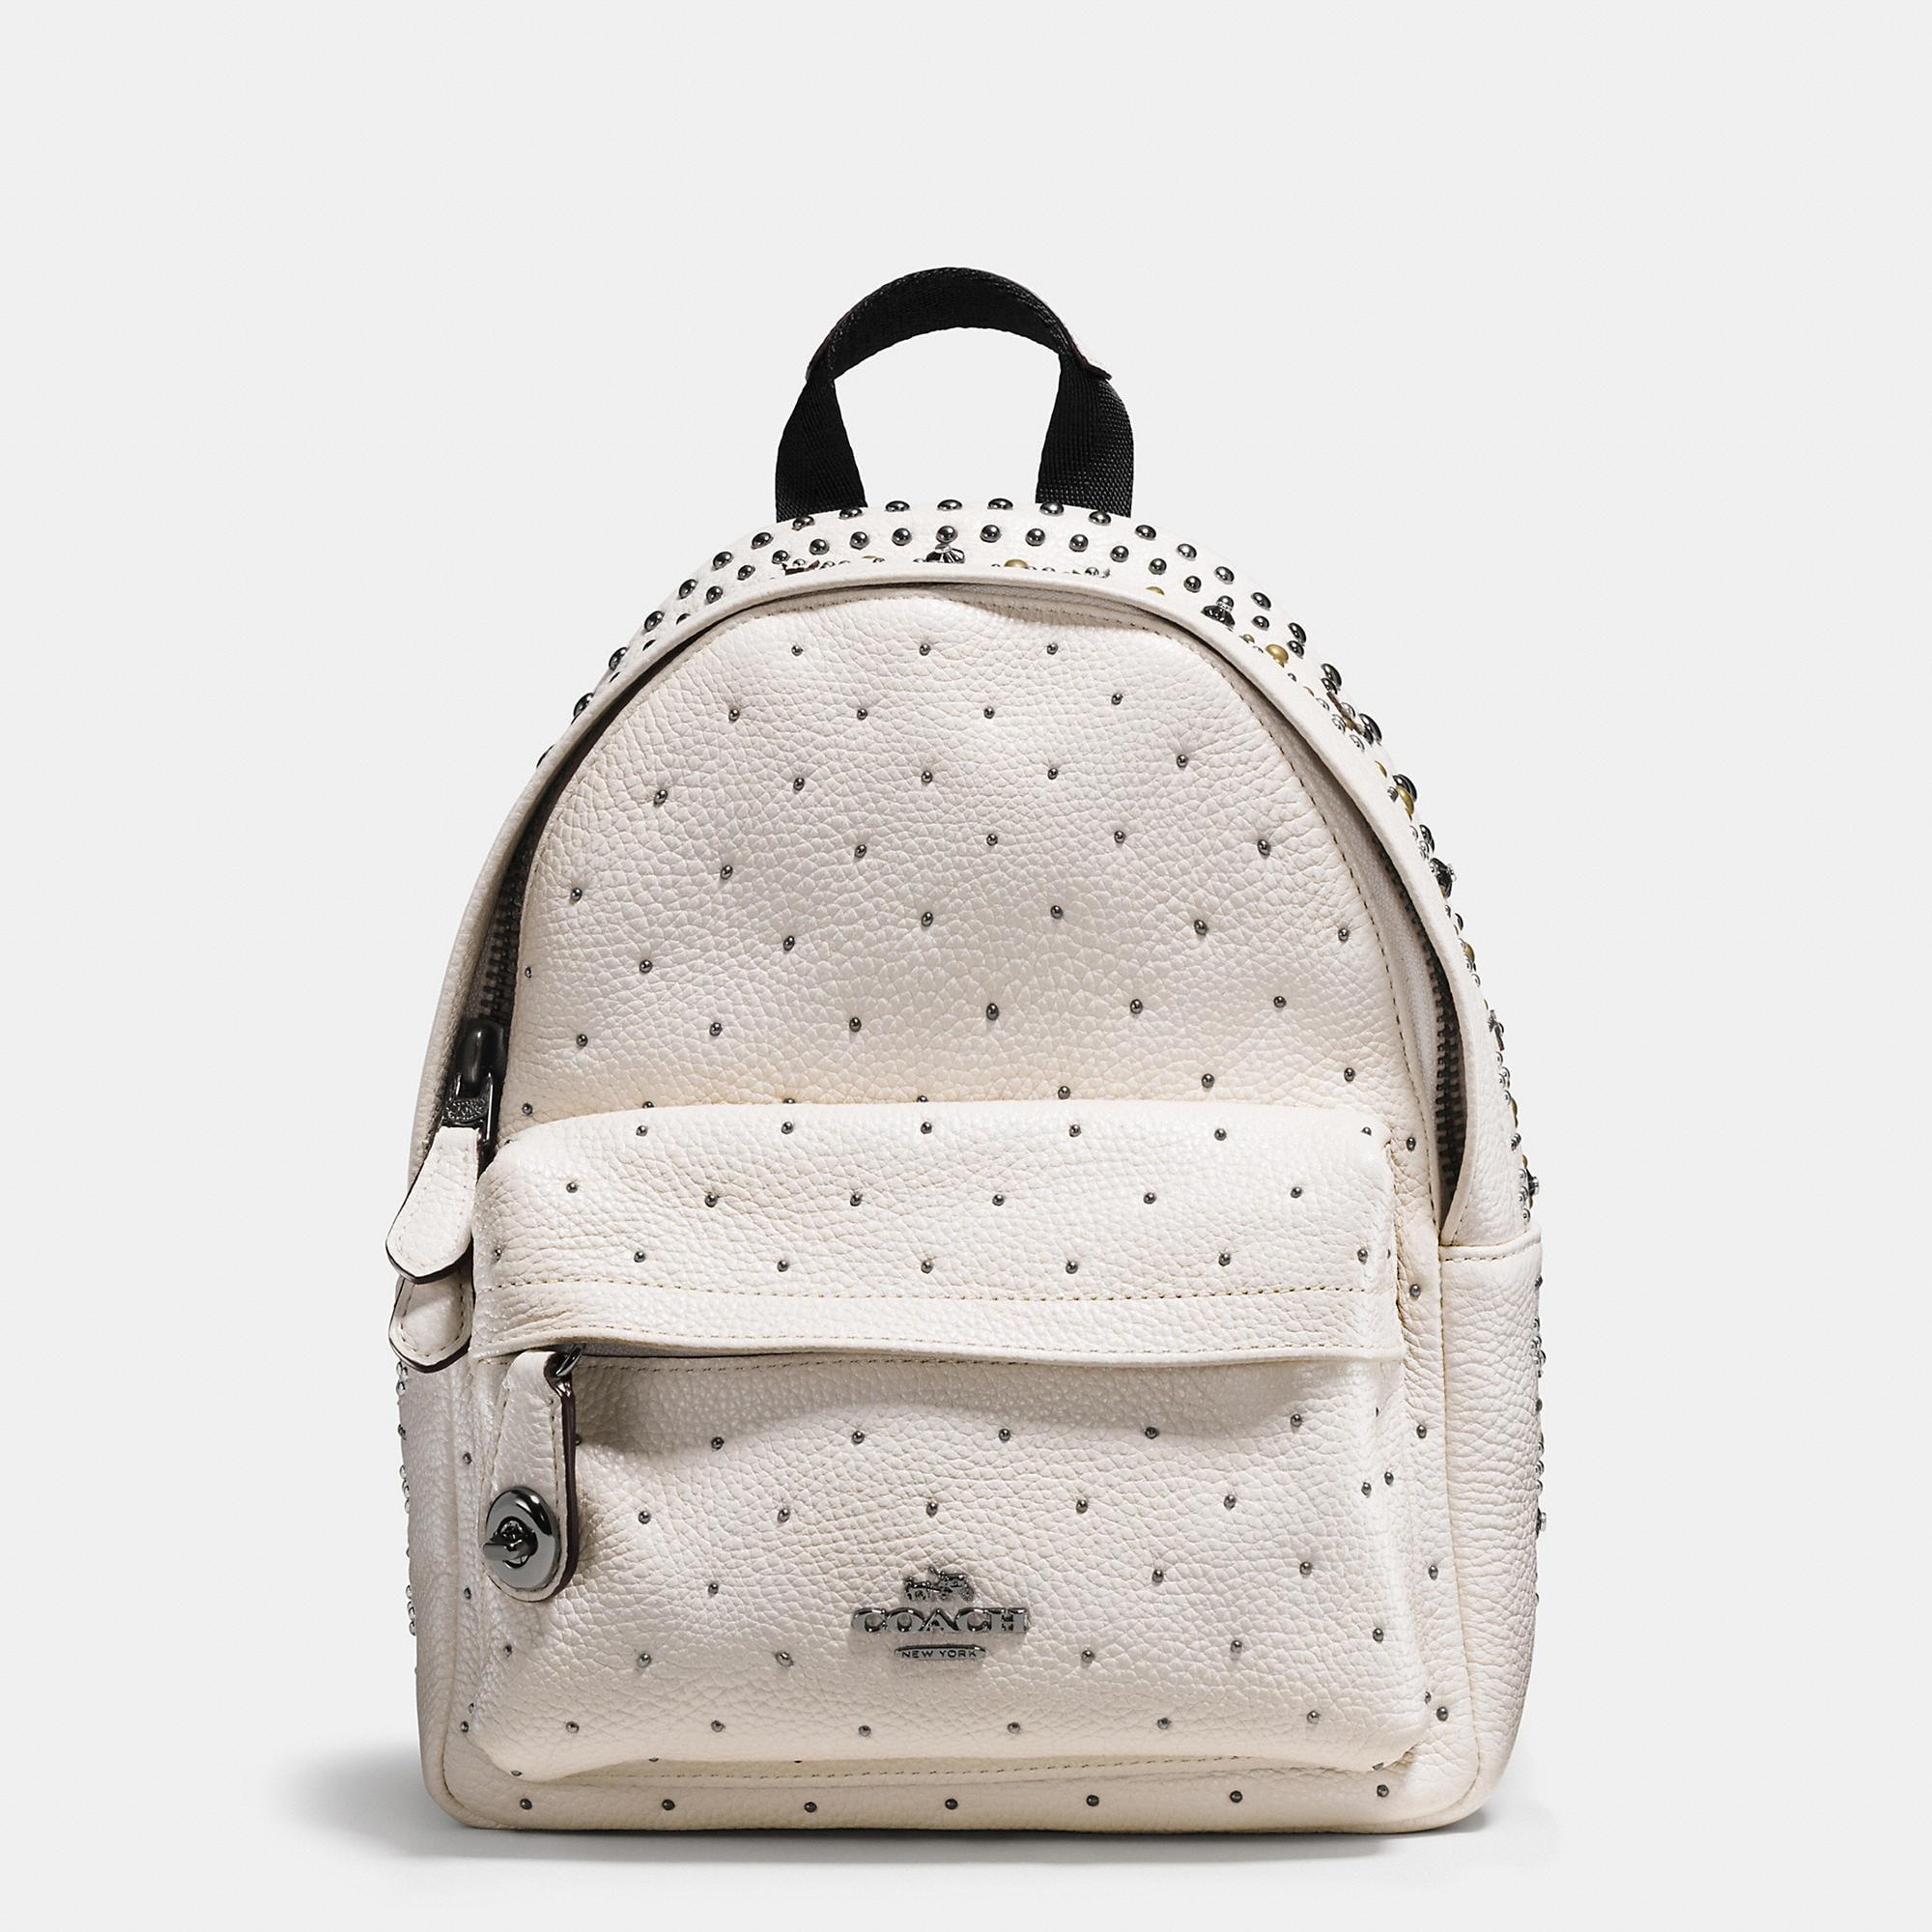 Coach Mini Campus Backpack With Bandana Rivets